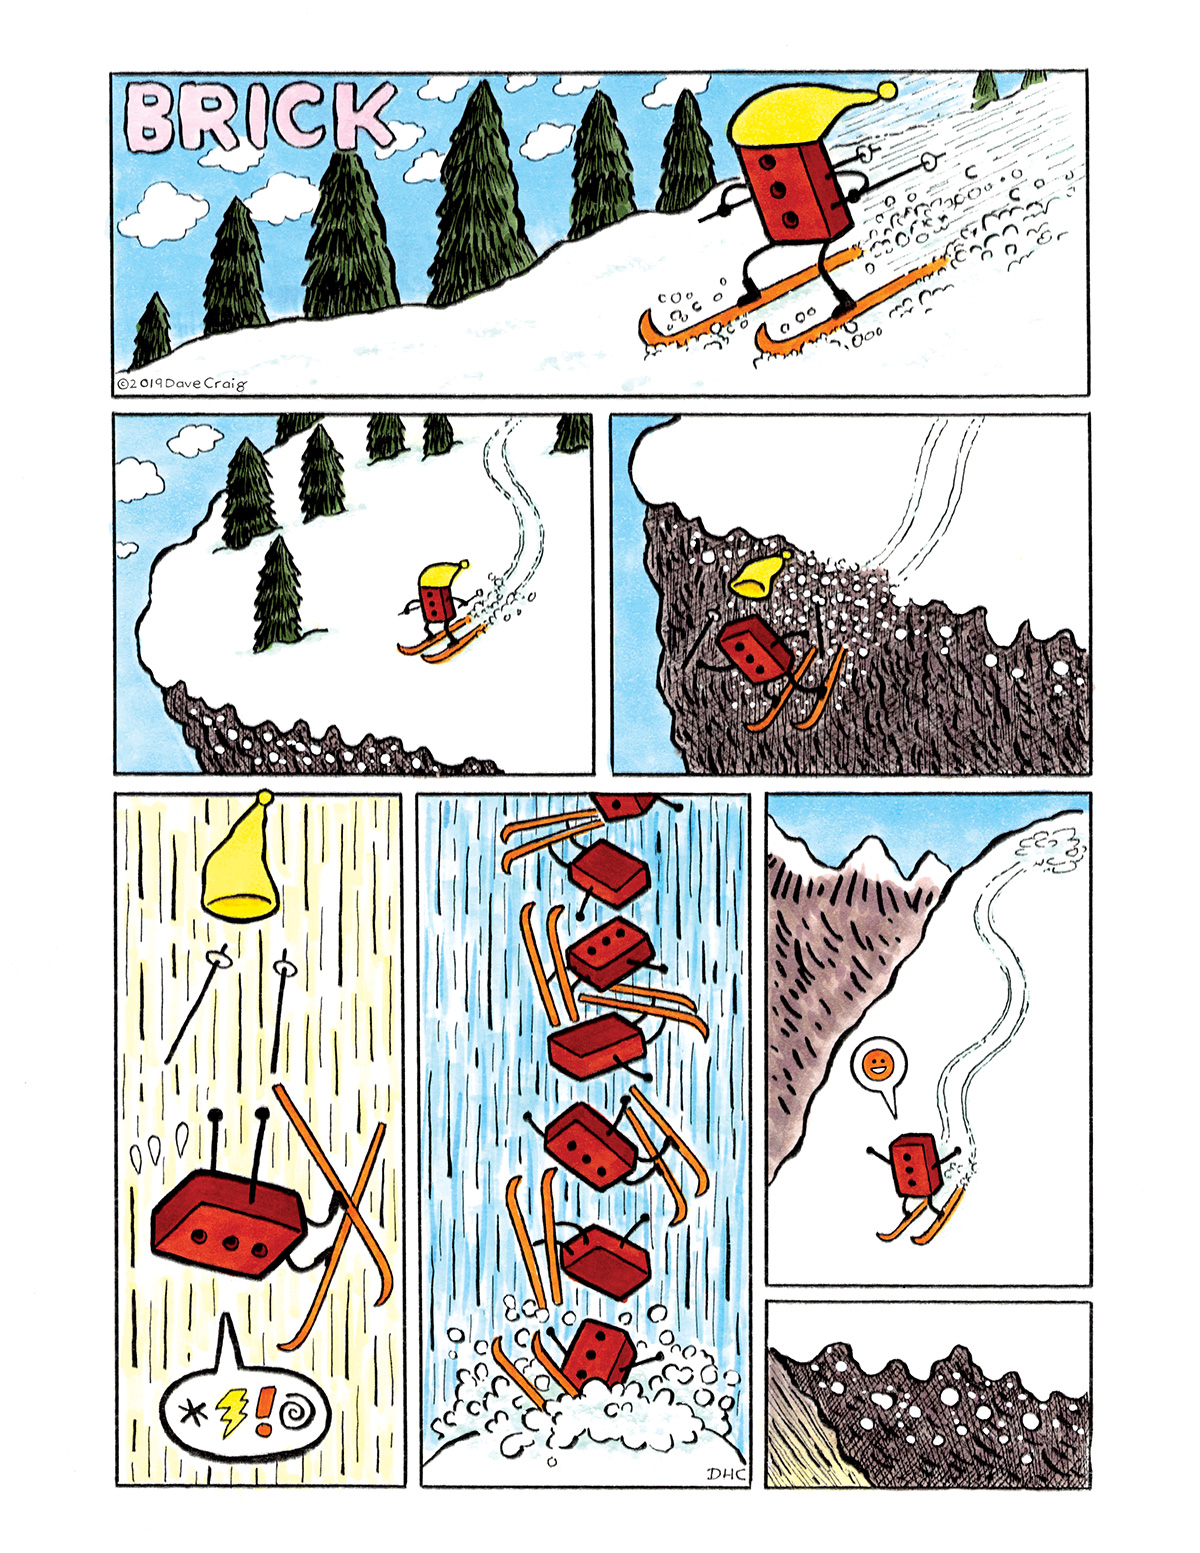 Brick comic by David Craig